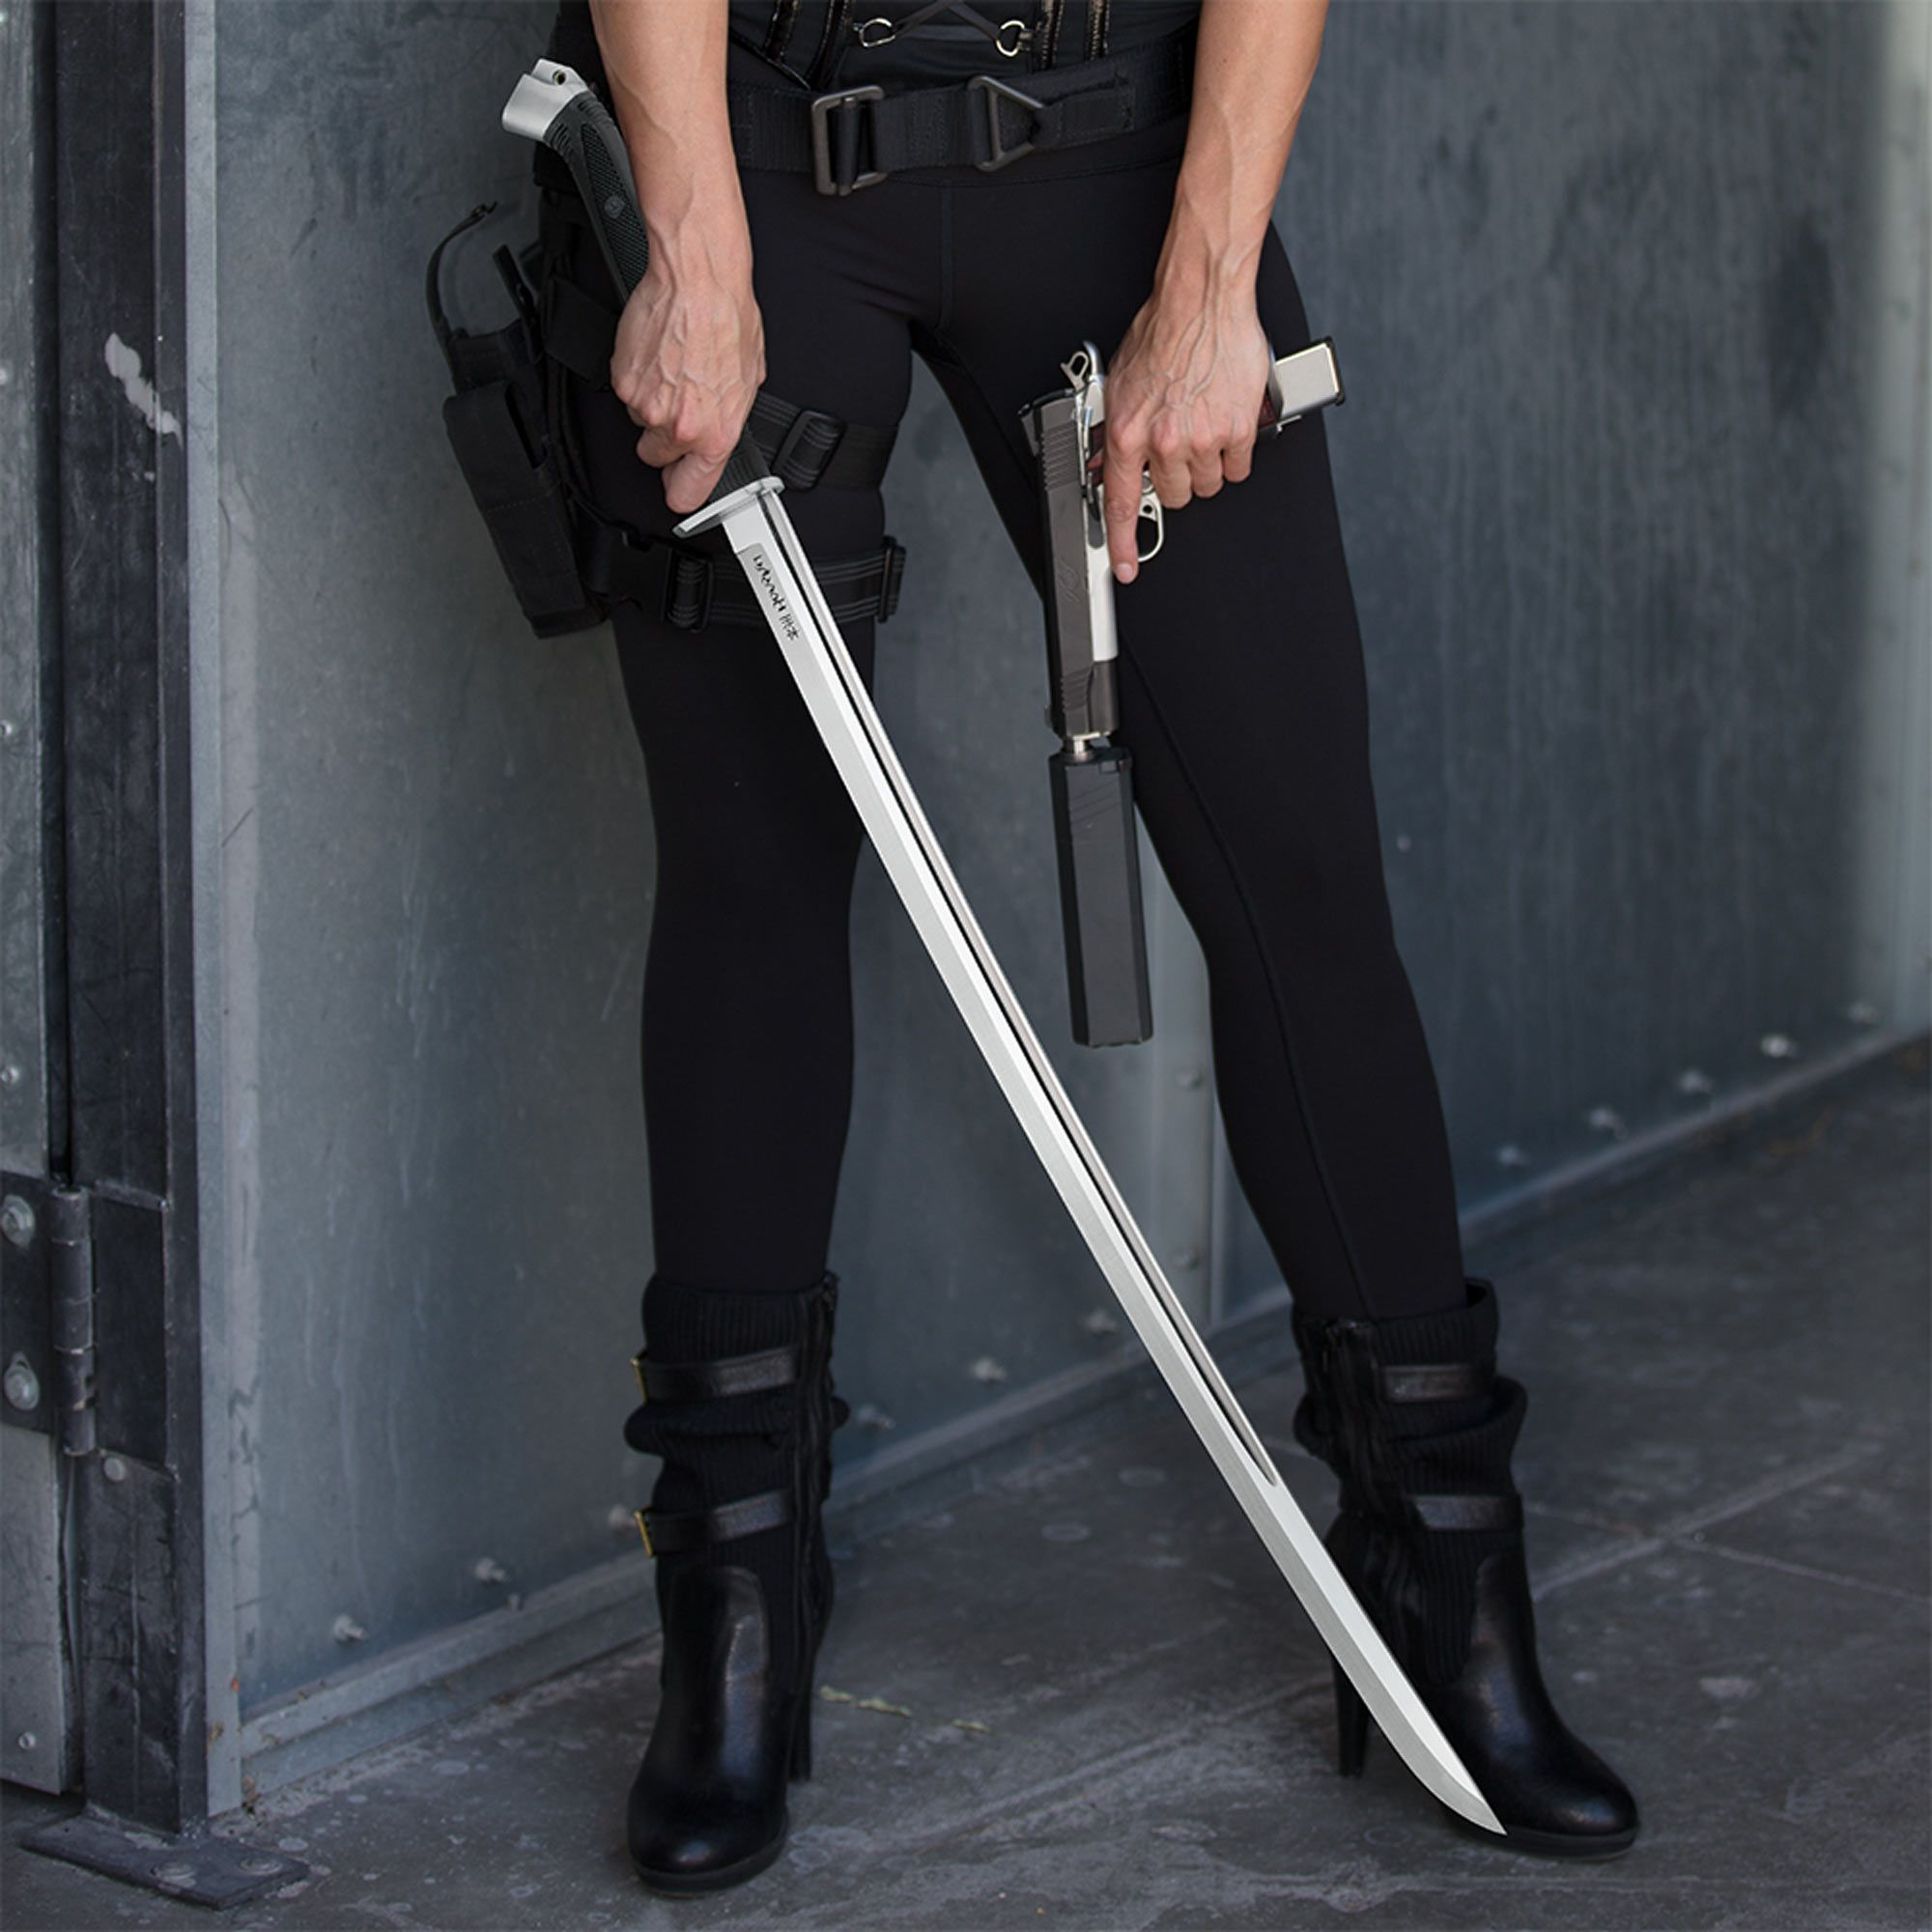 This Ain T Your Ordinary Katana Folks Designed For Real World Combat In The Modern World The Honshu Boshin Fuses Battle Pro Katana Ninja Sword Katana Swords